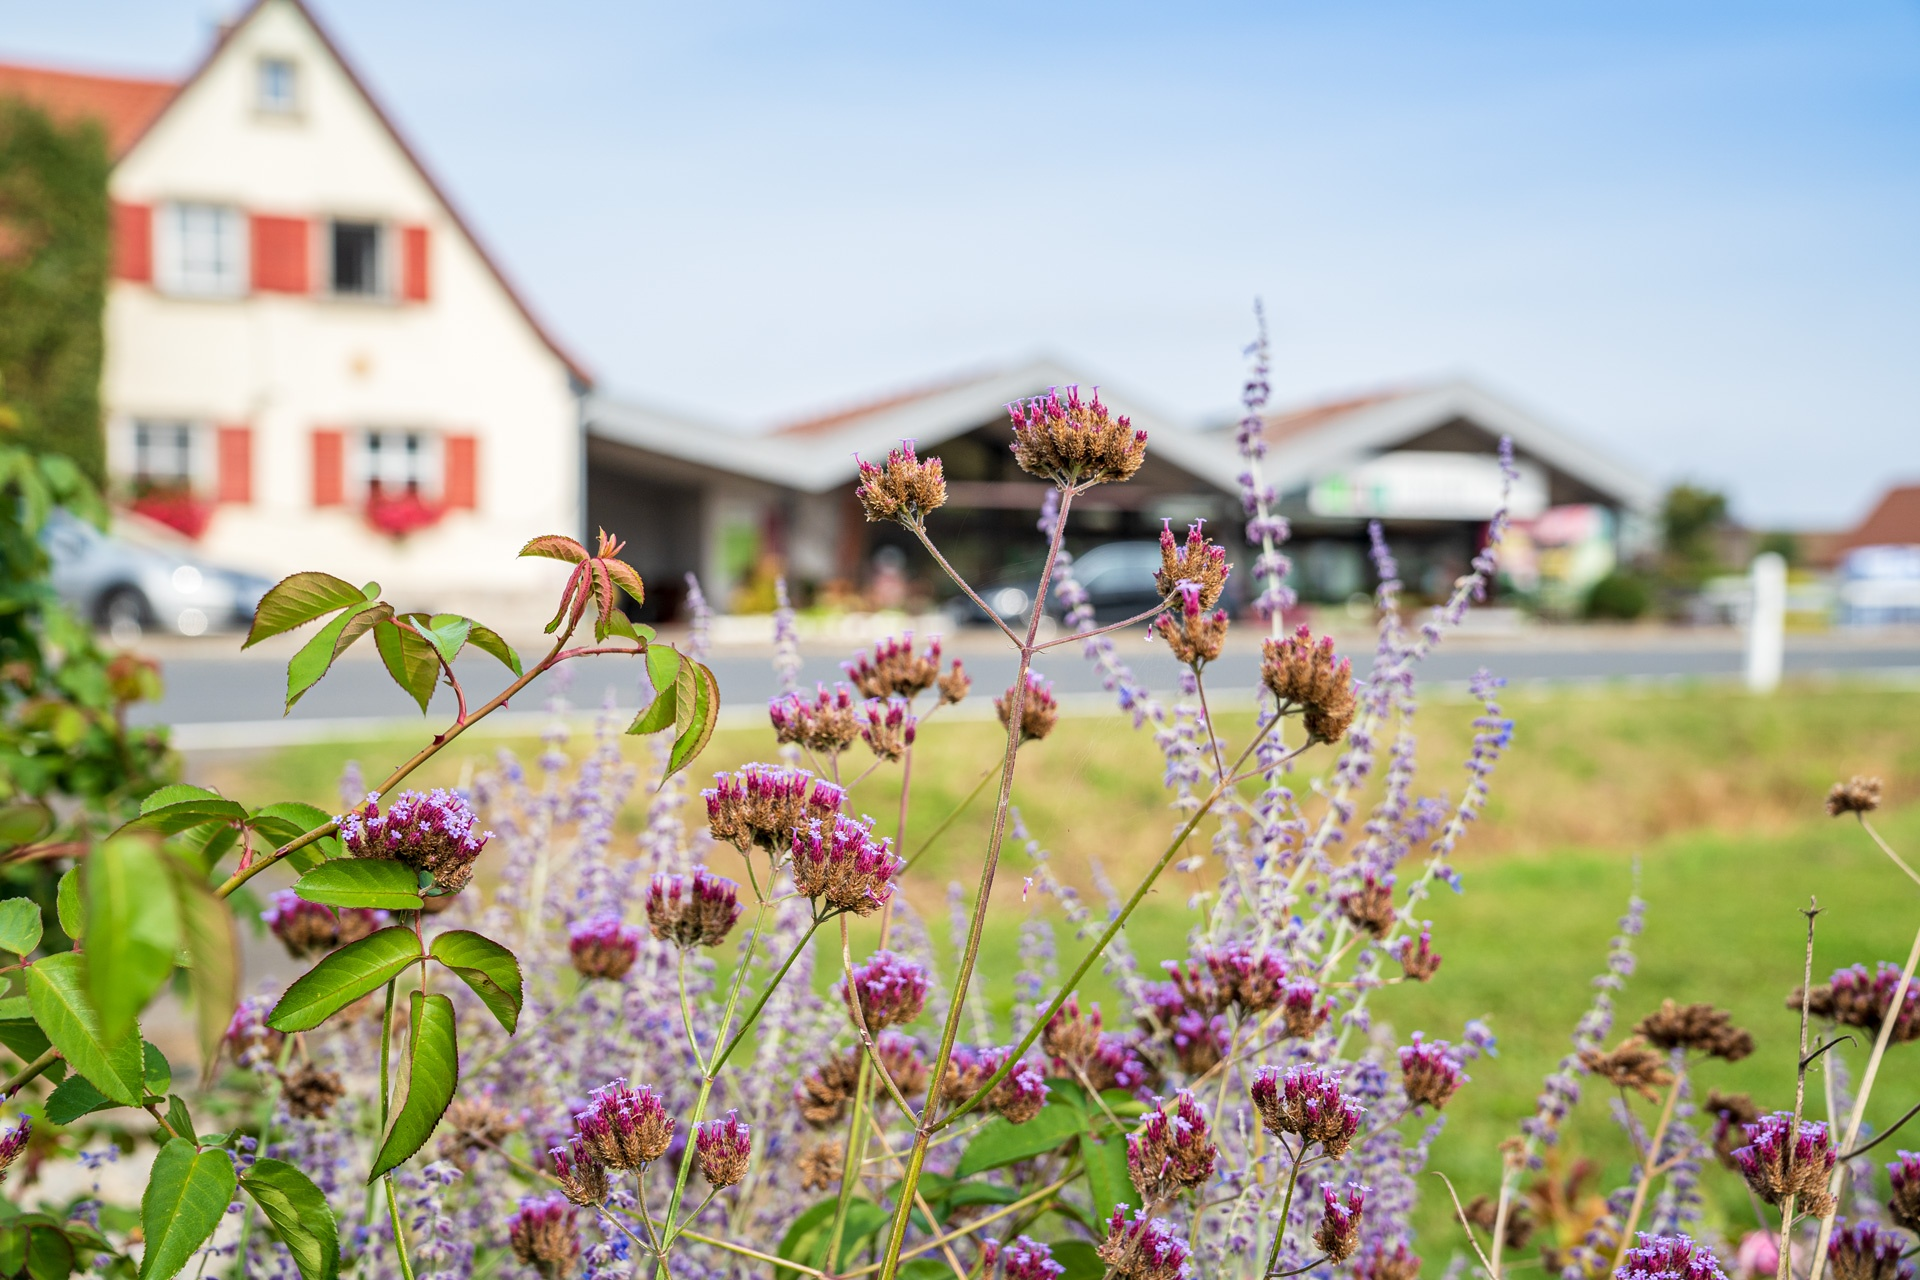 Gärtnerei Schunke in Hüttenheim